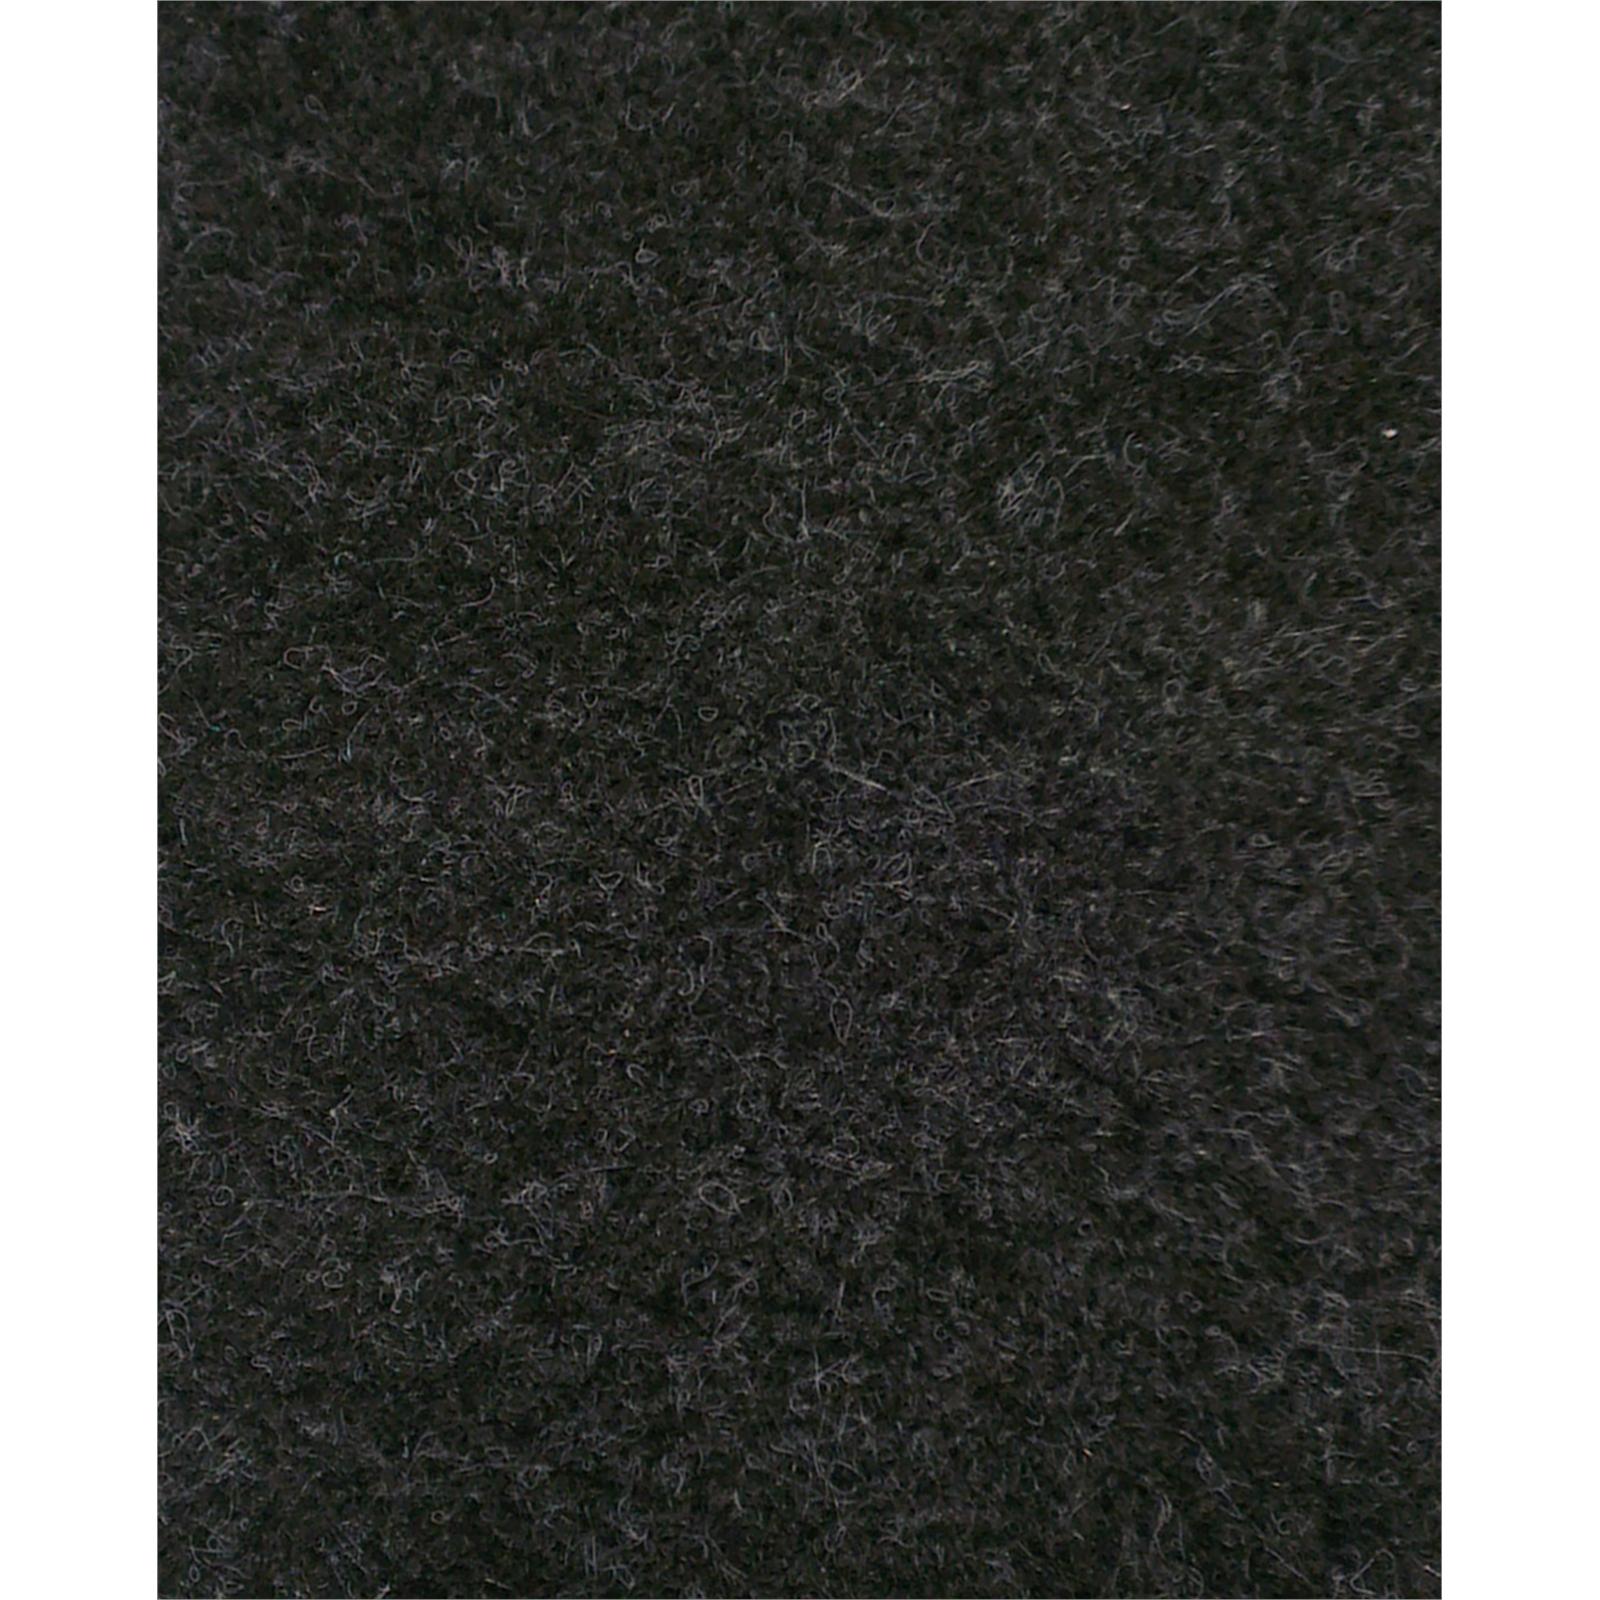 Ideal DIY Floors 1.3m Charcoal SUV Garage Utility Car Flat Carpet